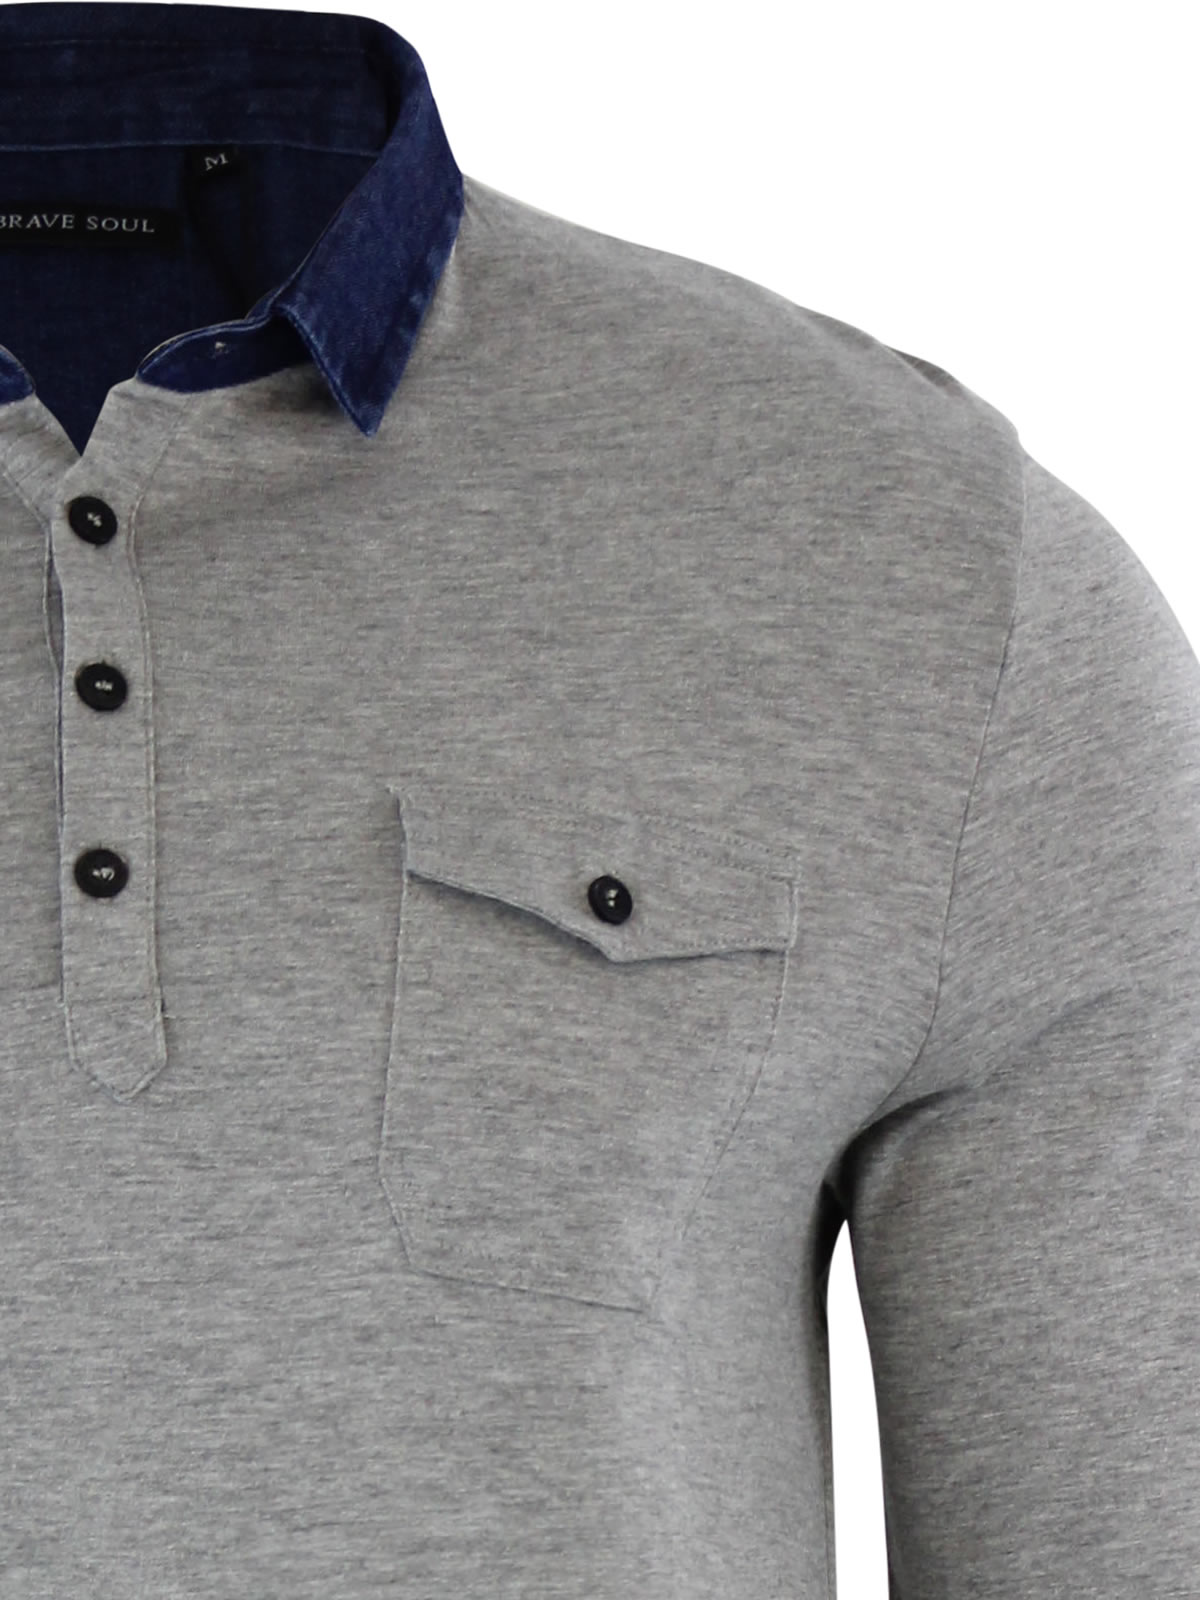 Mens-Polo-T-Shirt-Brave-Soul-Gospel-Denim-Collared-Long-Sleeve-Casual-Top thumbnail 4